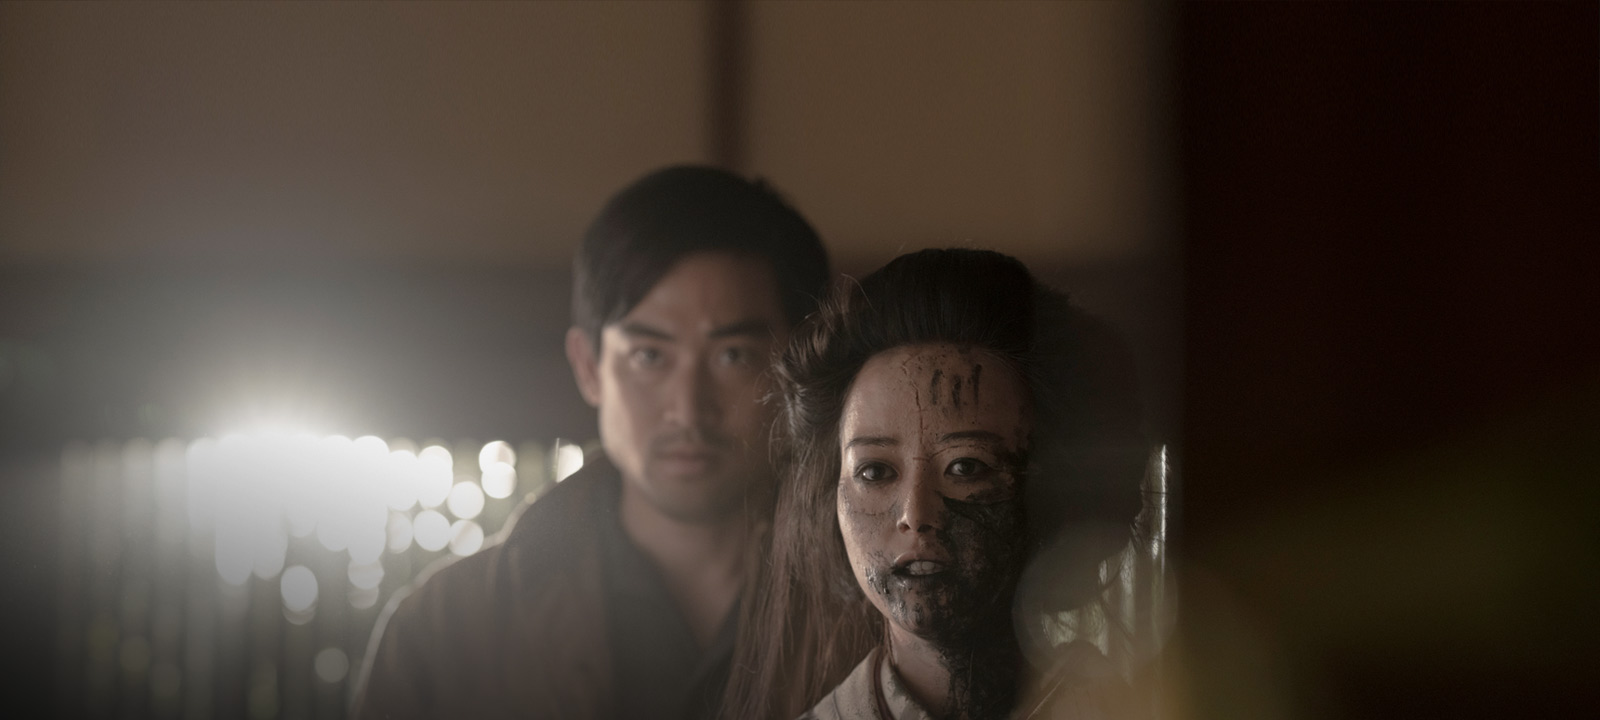 the-terror-infamy-post-210-Kiki-Sukezane-Yuko-Derek-Mio-Chester-Nakayama_800x600